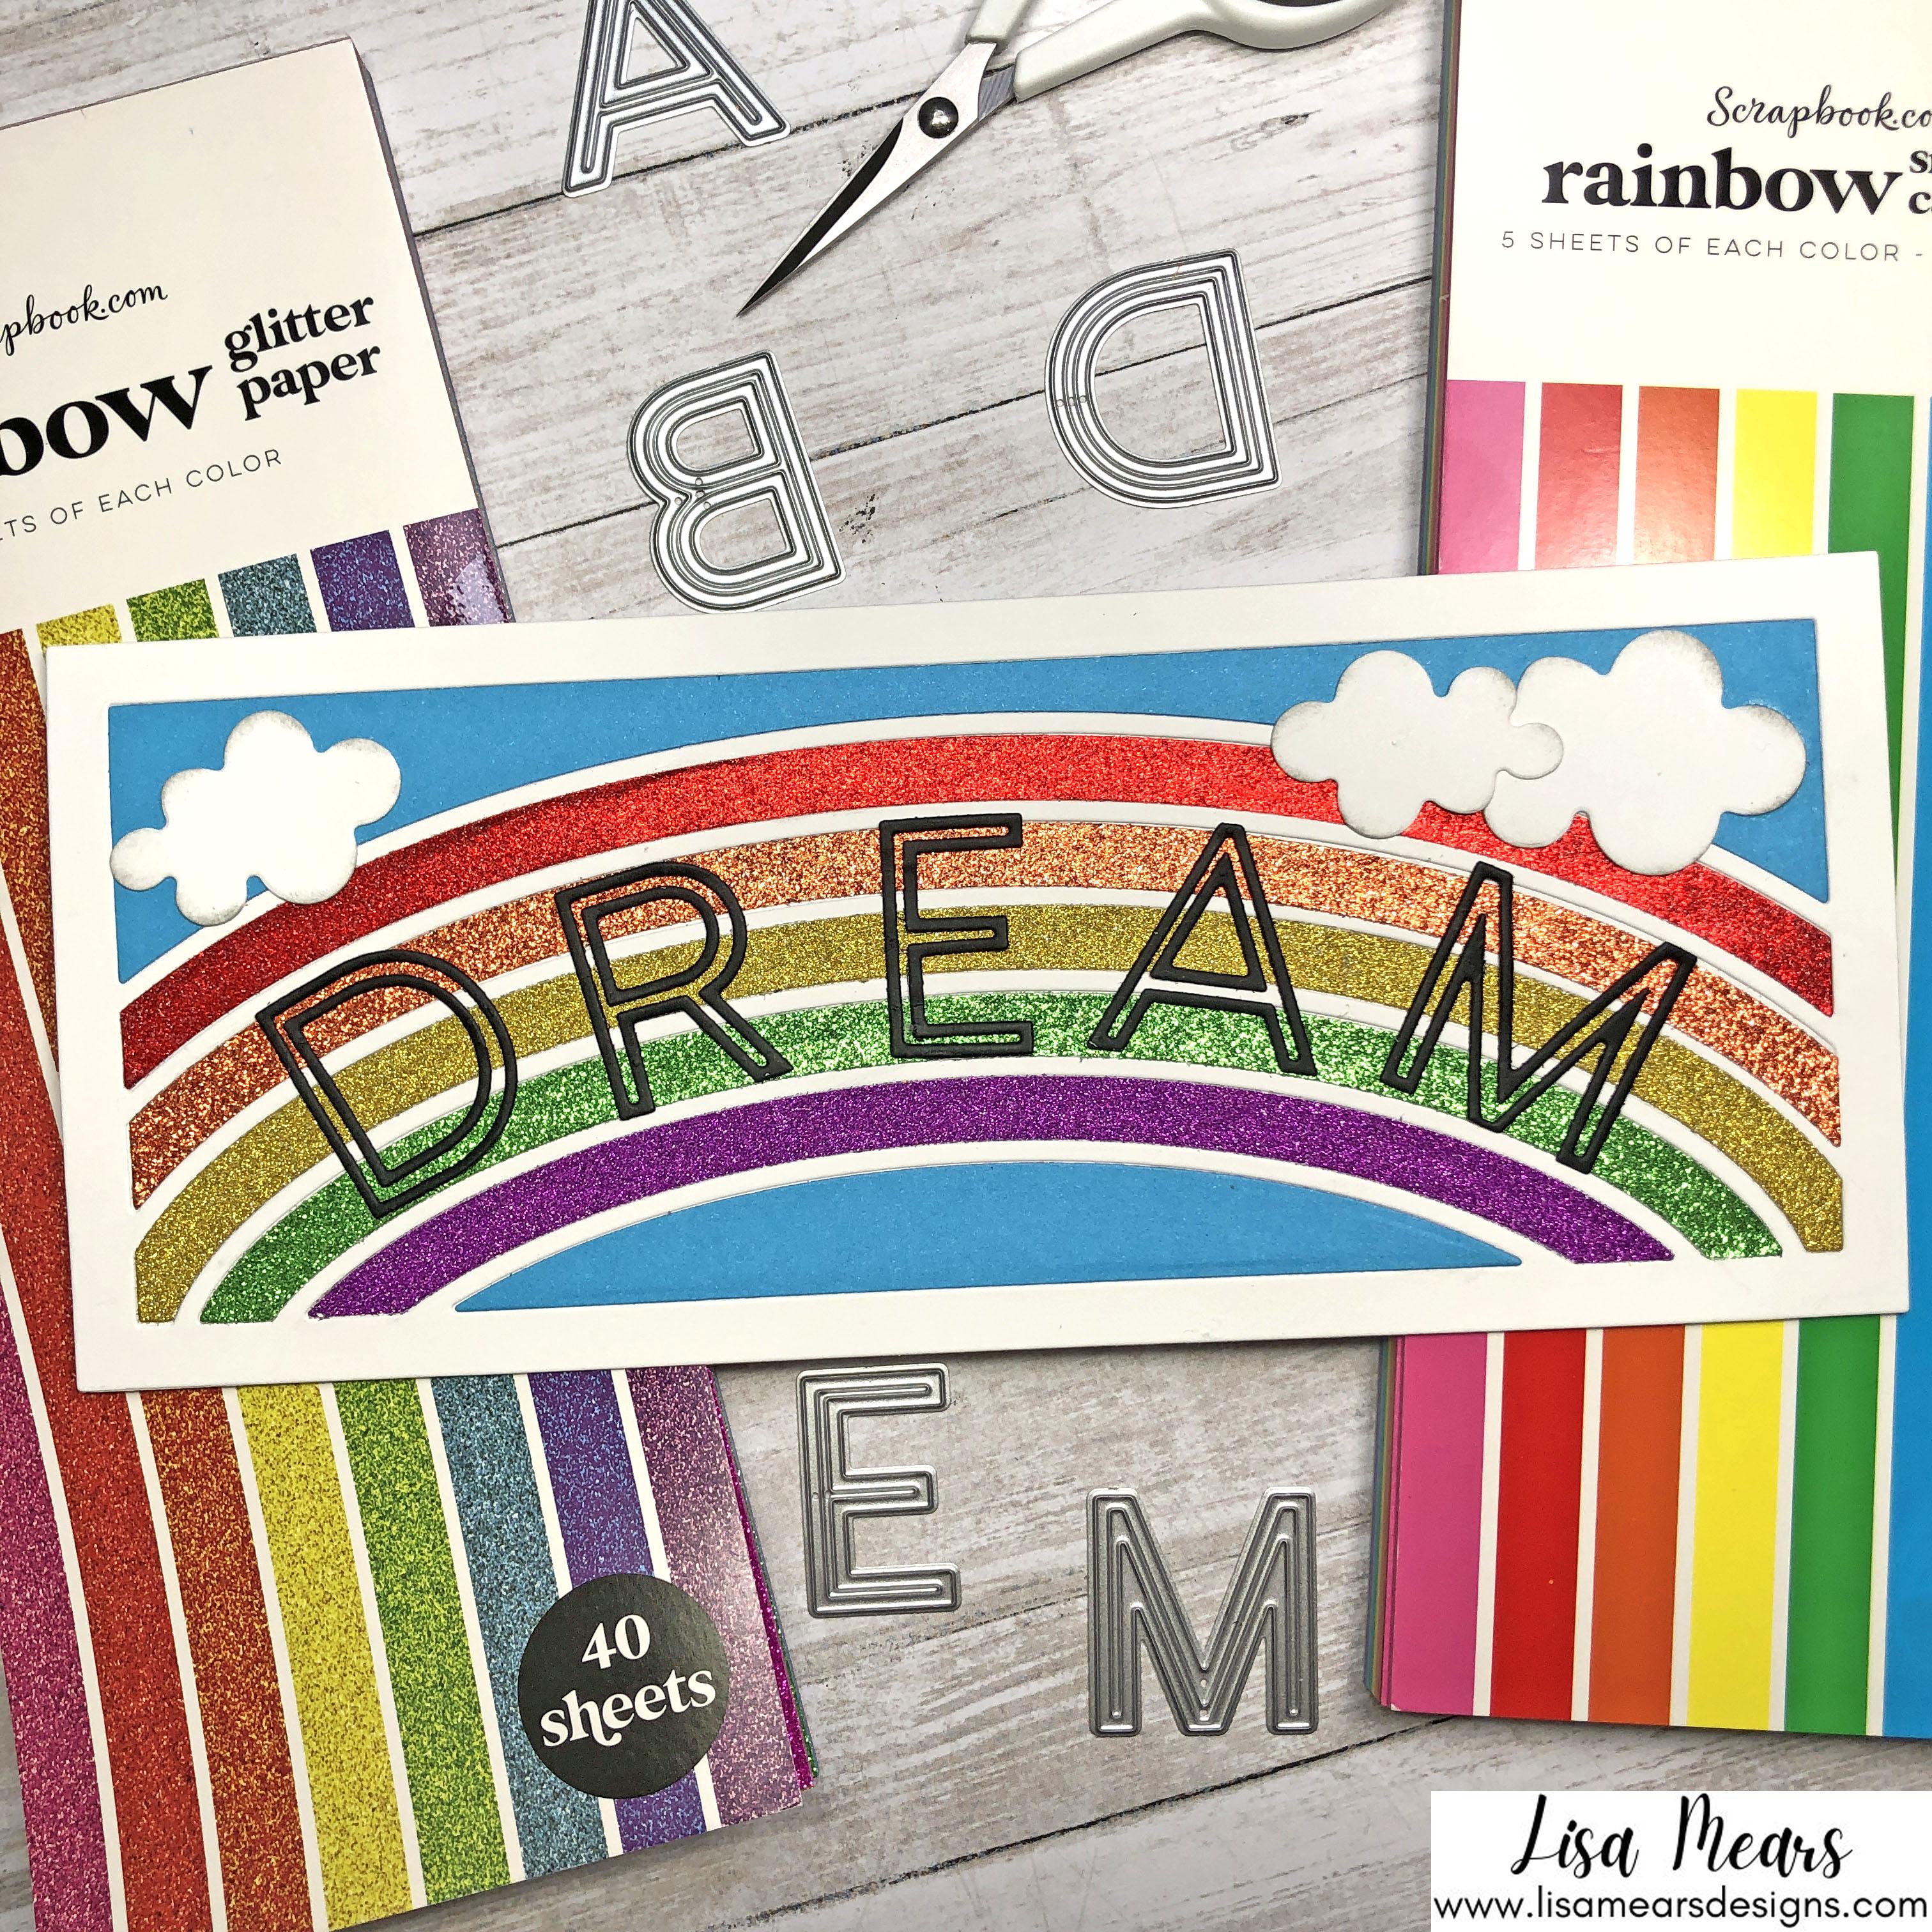 Using Glitter Cardstock - Scrapbook.com Rainbow Glitter Cardstock, Downtown Alphabet Dies, and Waffle Flower Rainbow Slimline Die